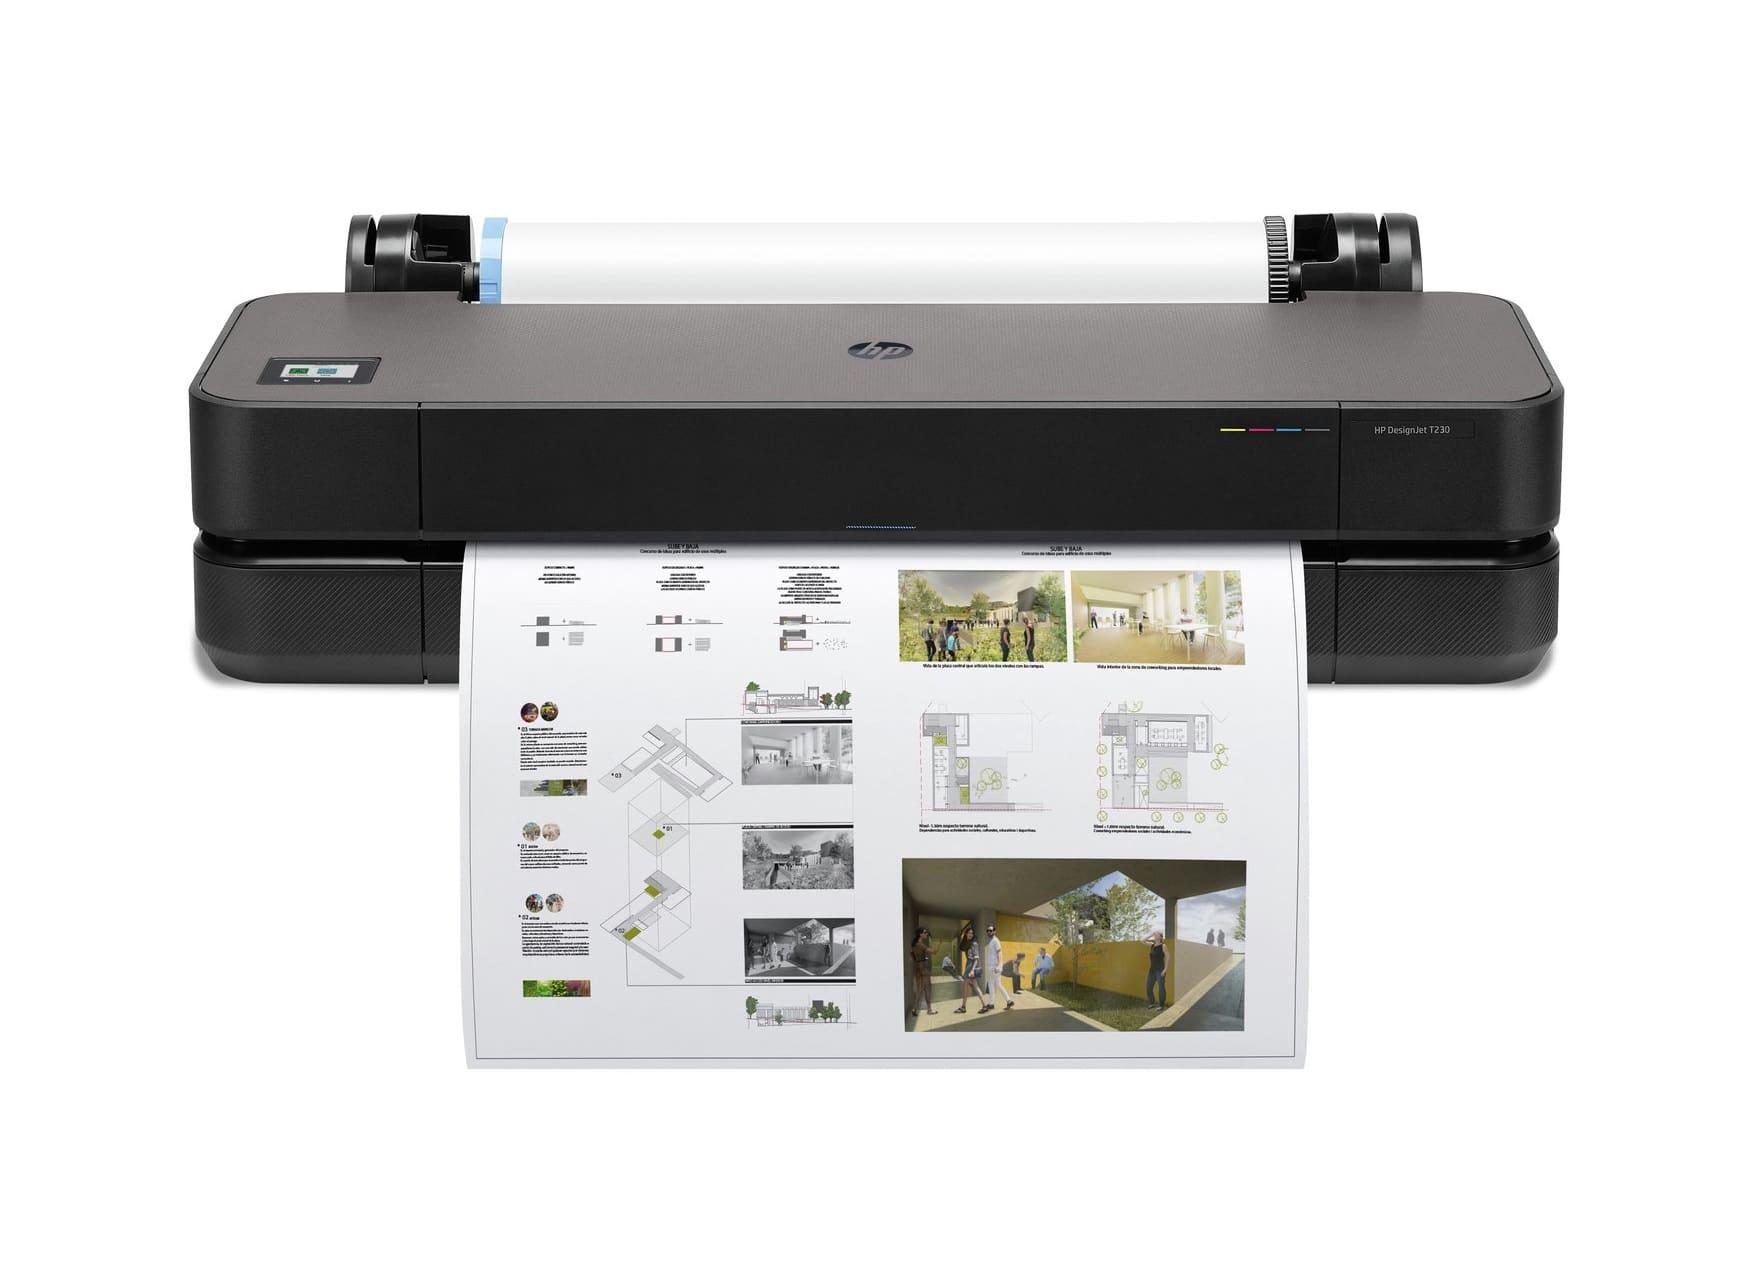 Impresora plotter HP DesignJet T250 de gran formato (hasta A1) de 24 pulgadas